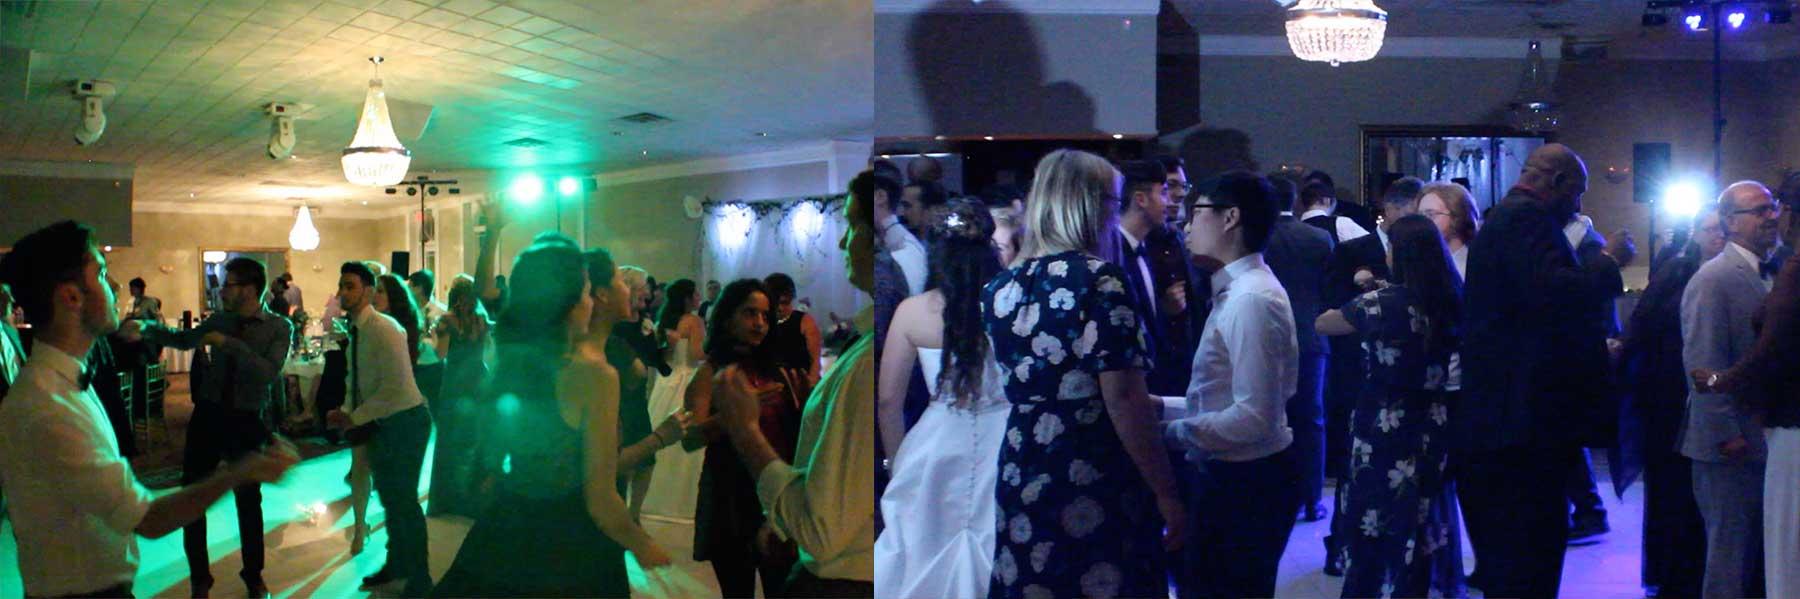 Kooltempo-Weddings-at-Caledon-Estates-Banquet-Hall-Bolton